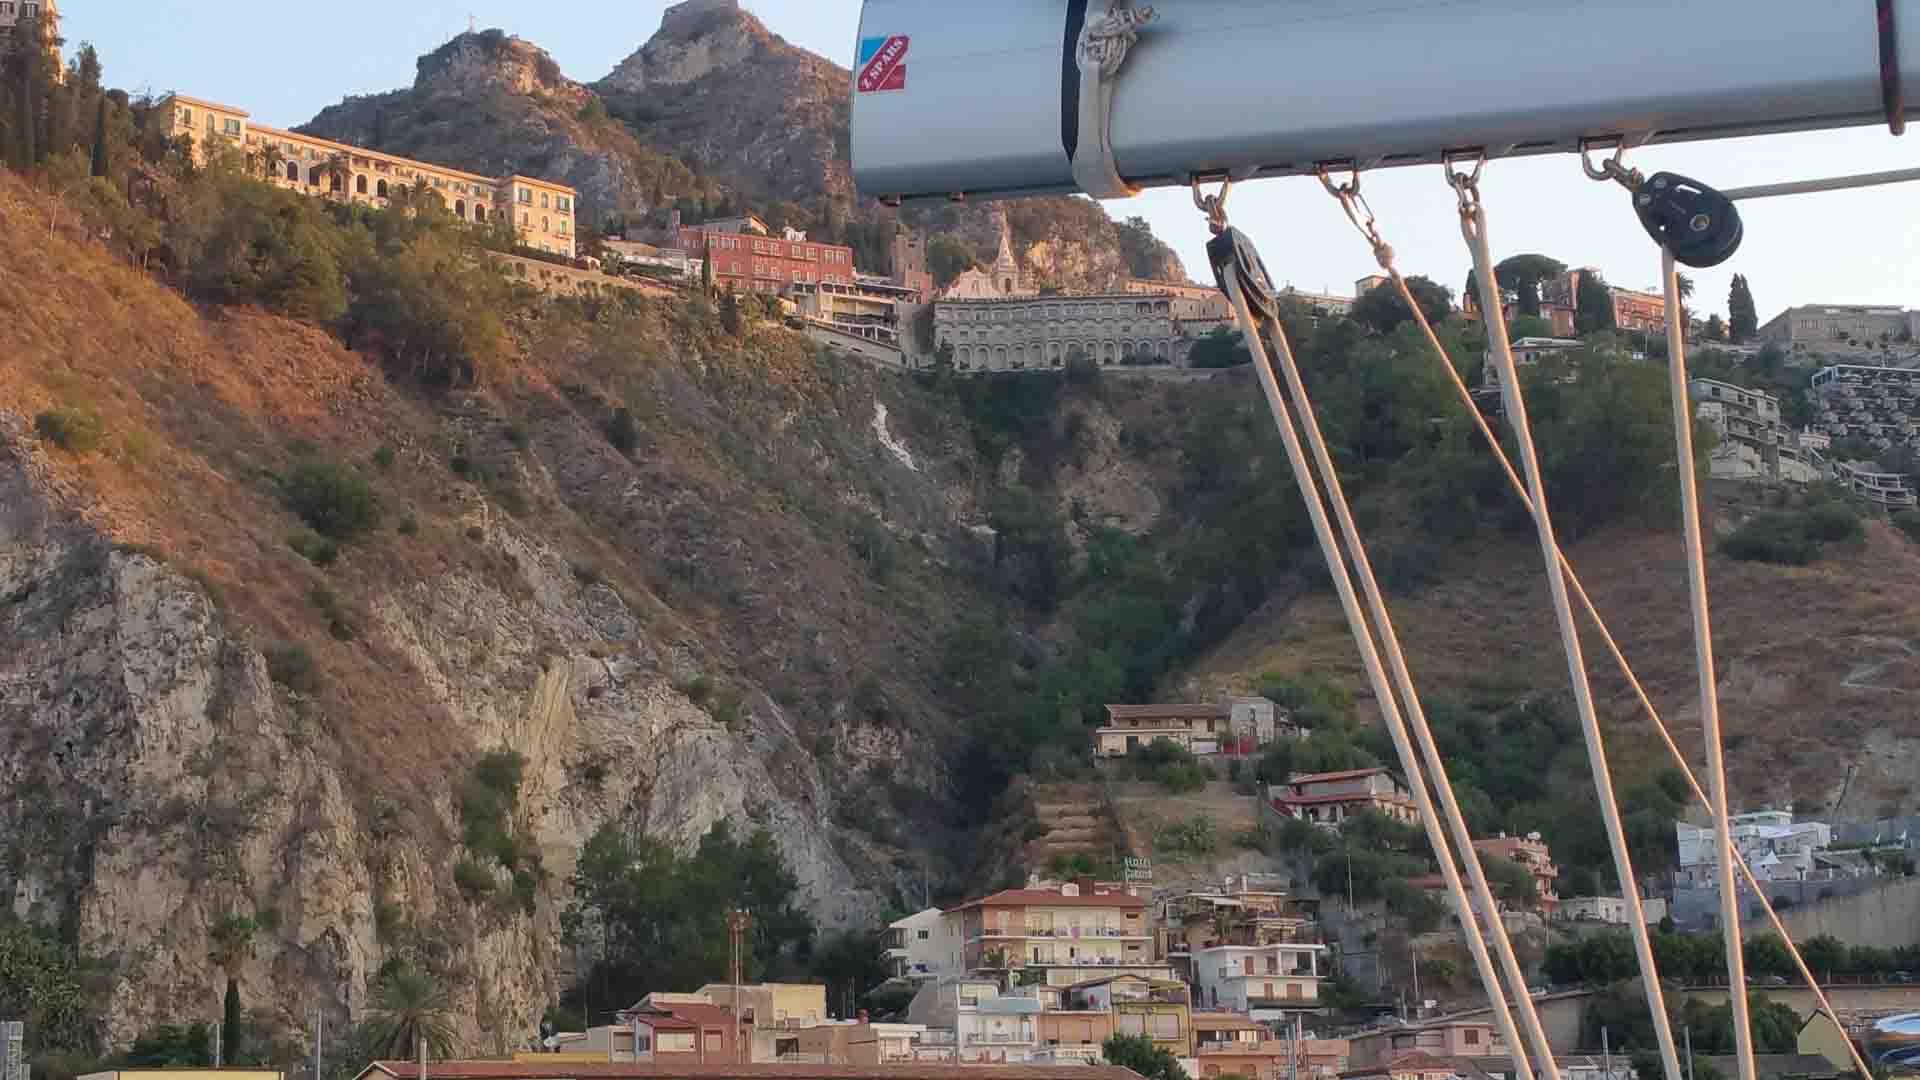 Siracusa Taormina porto periplo Sicilia Fontaine Pajot Saba 50 catamarano barca a vela